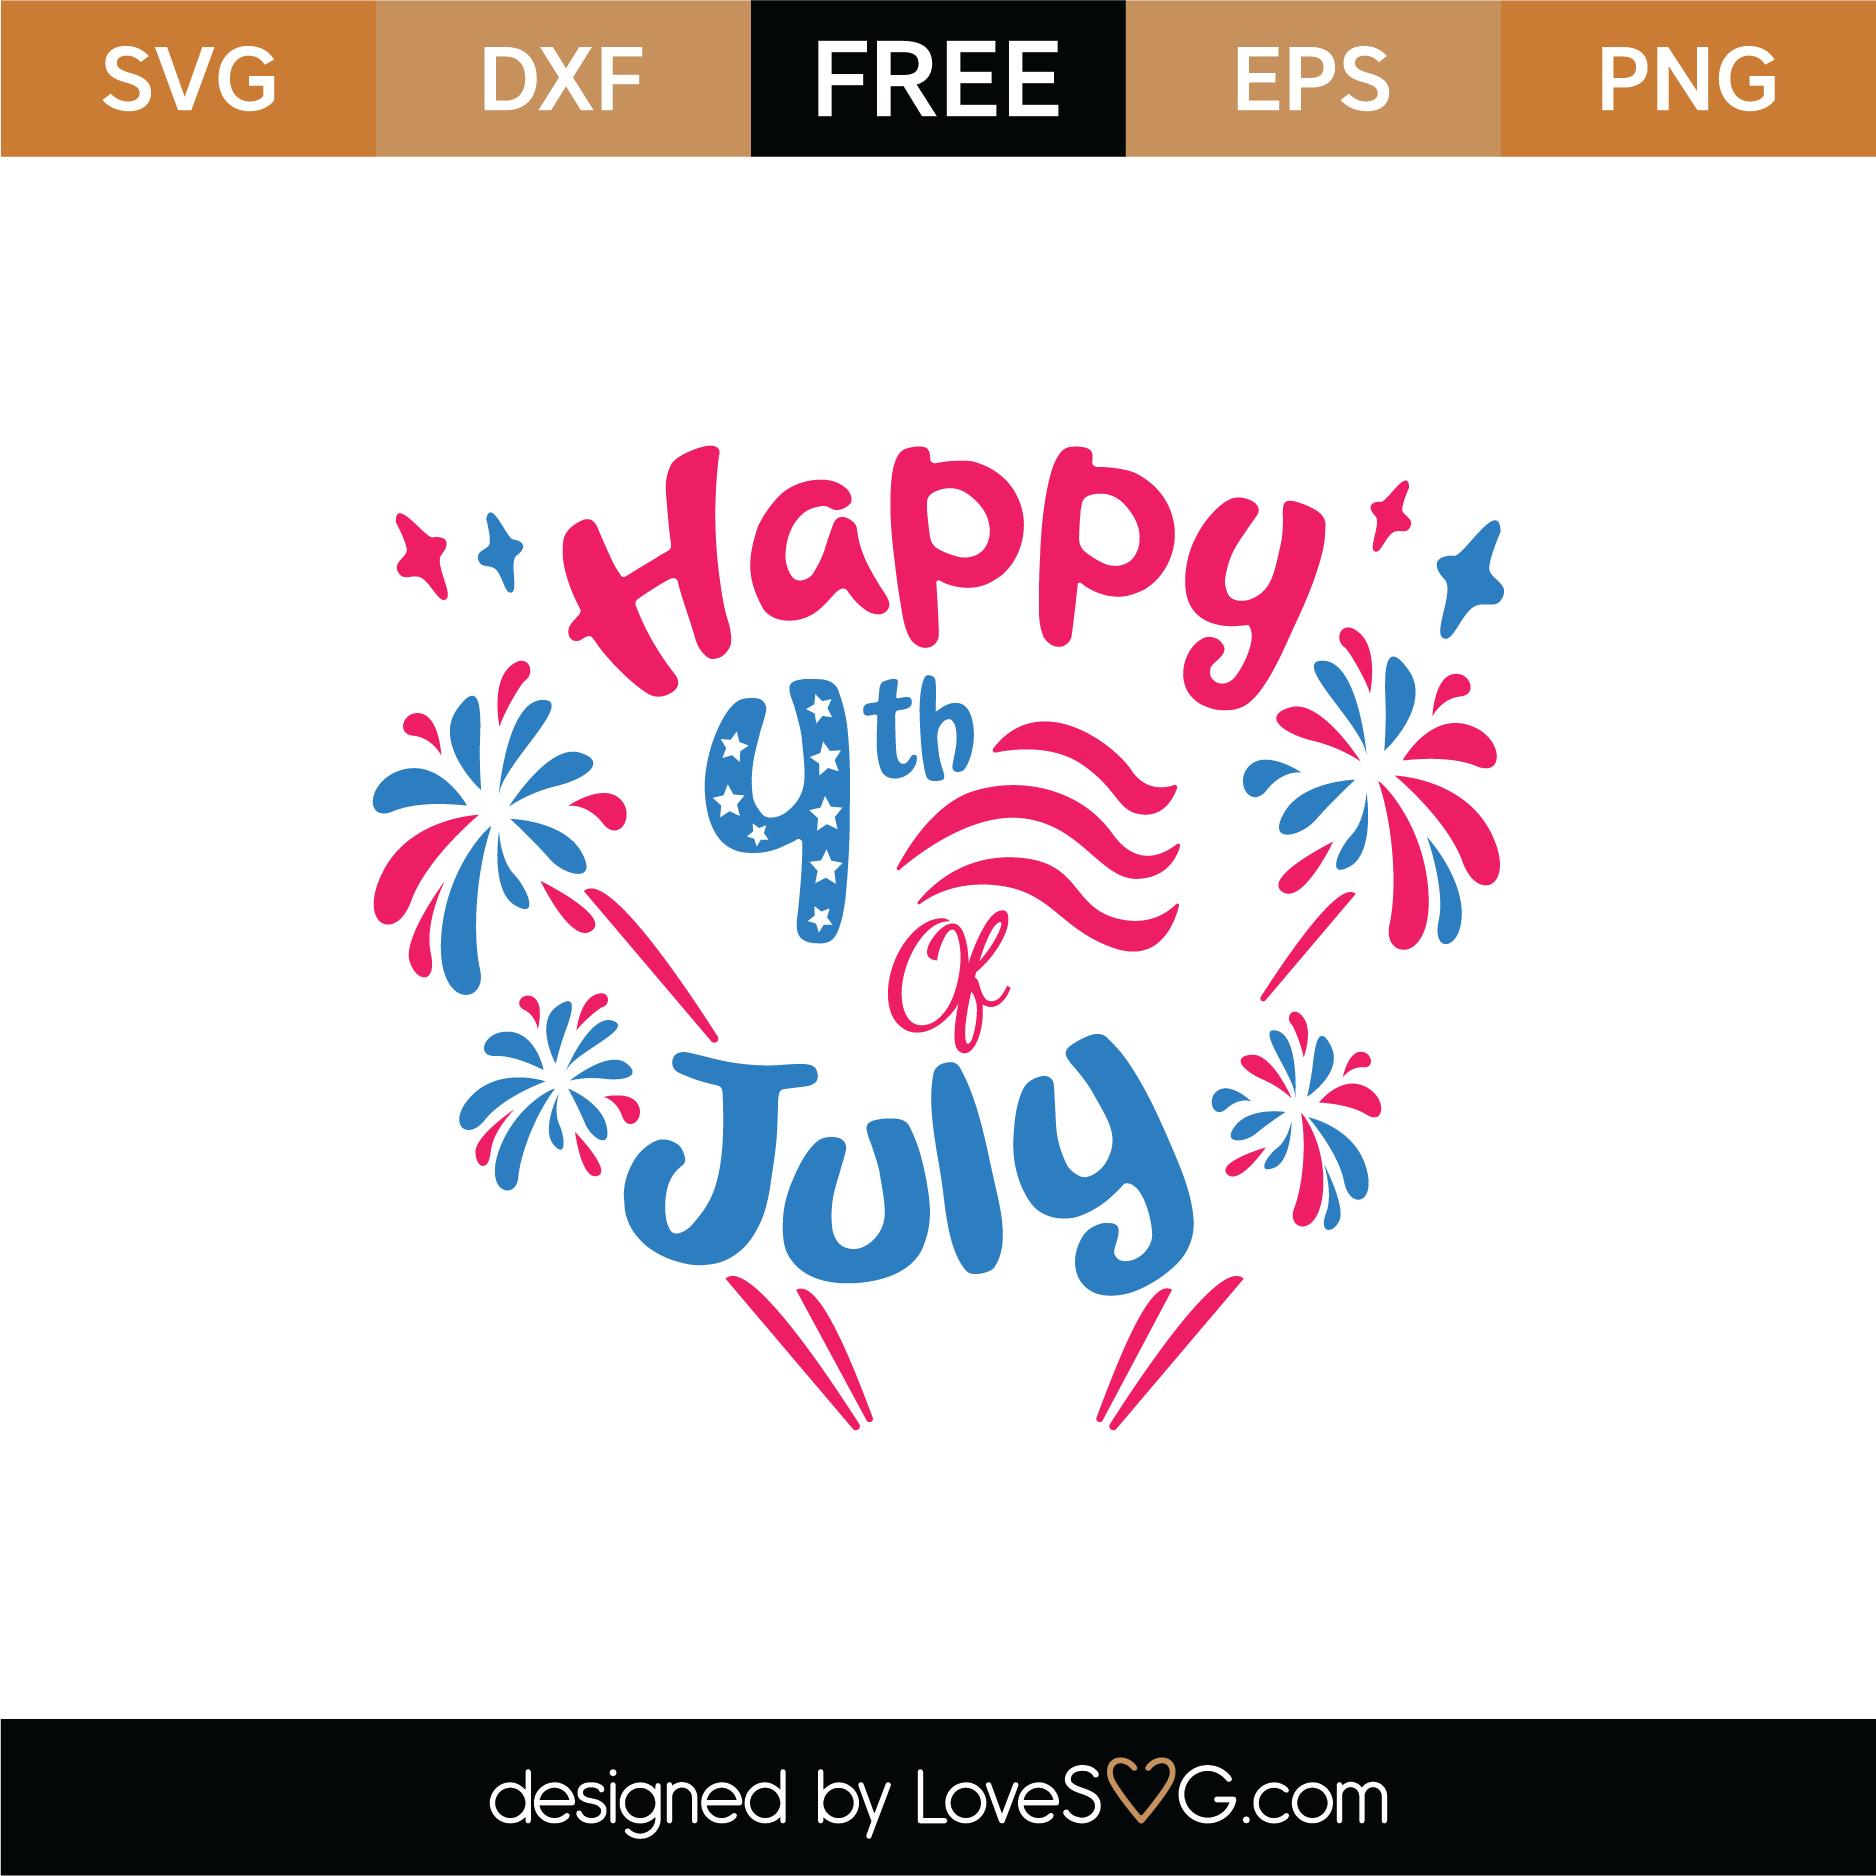 Download Free Happy 4th Of July SVG Cut File | Lovesvg.com